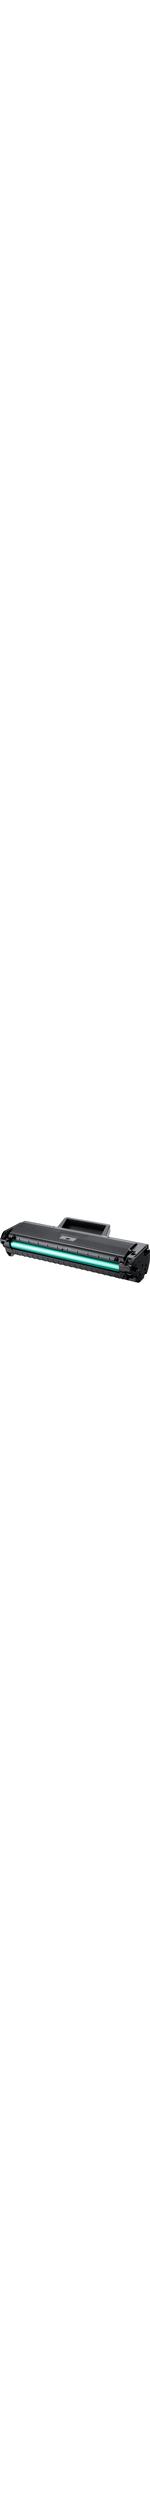 Samsung MLT-D1042S Toner Cartridge - Black